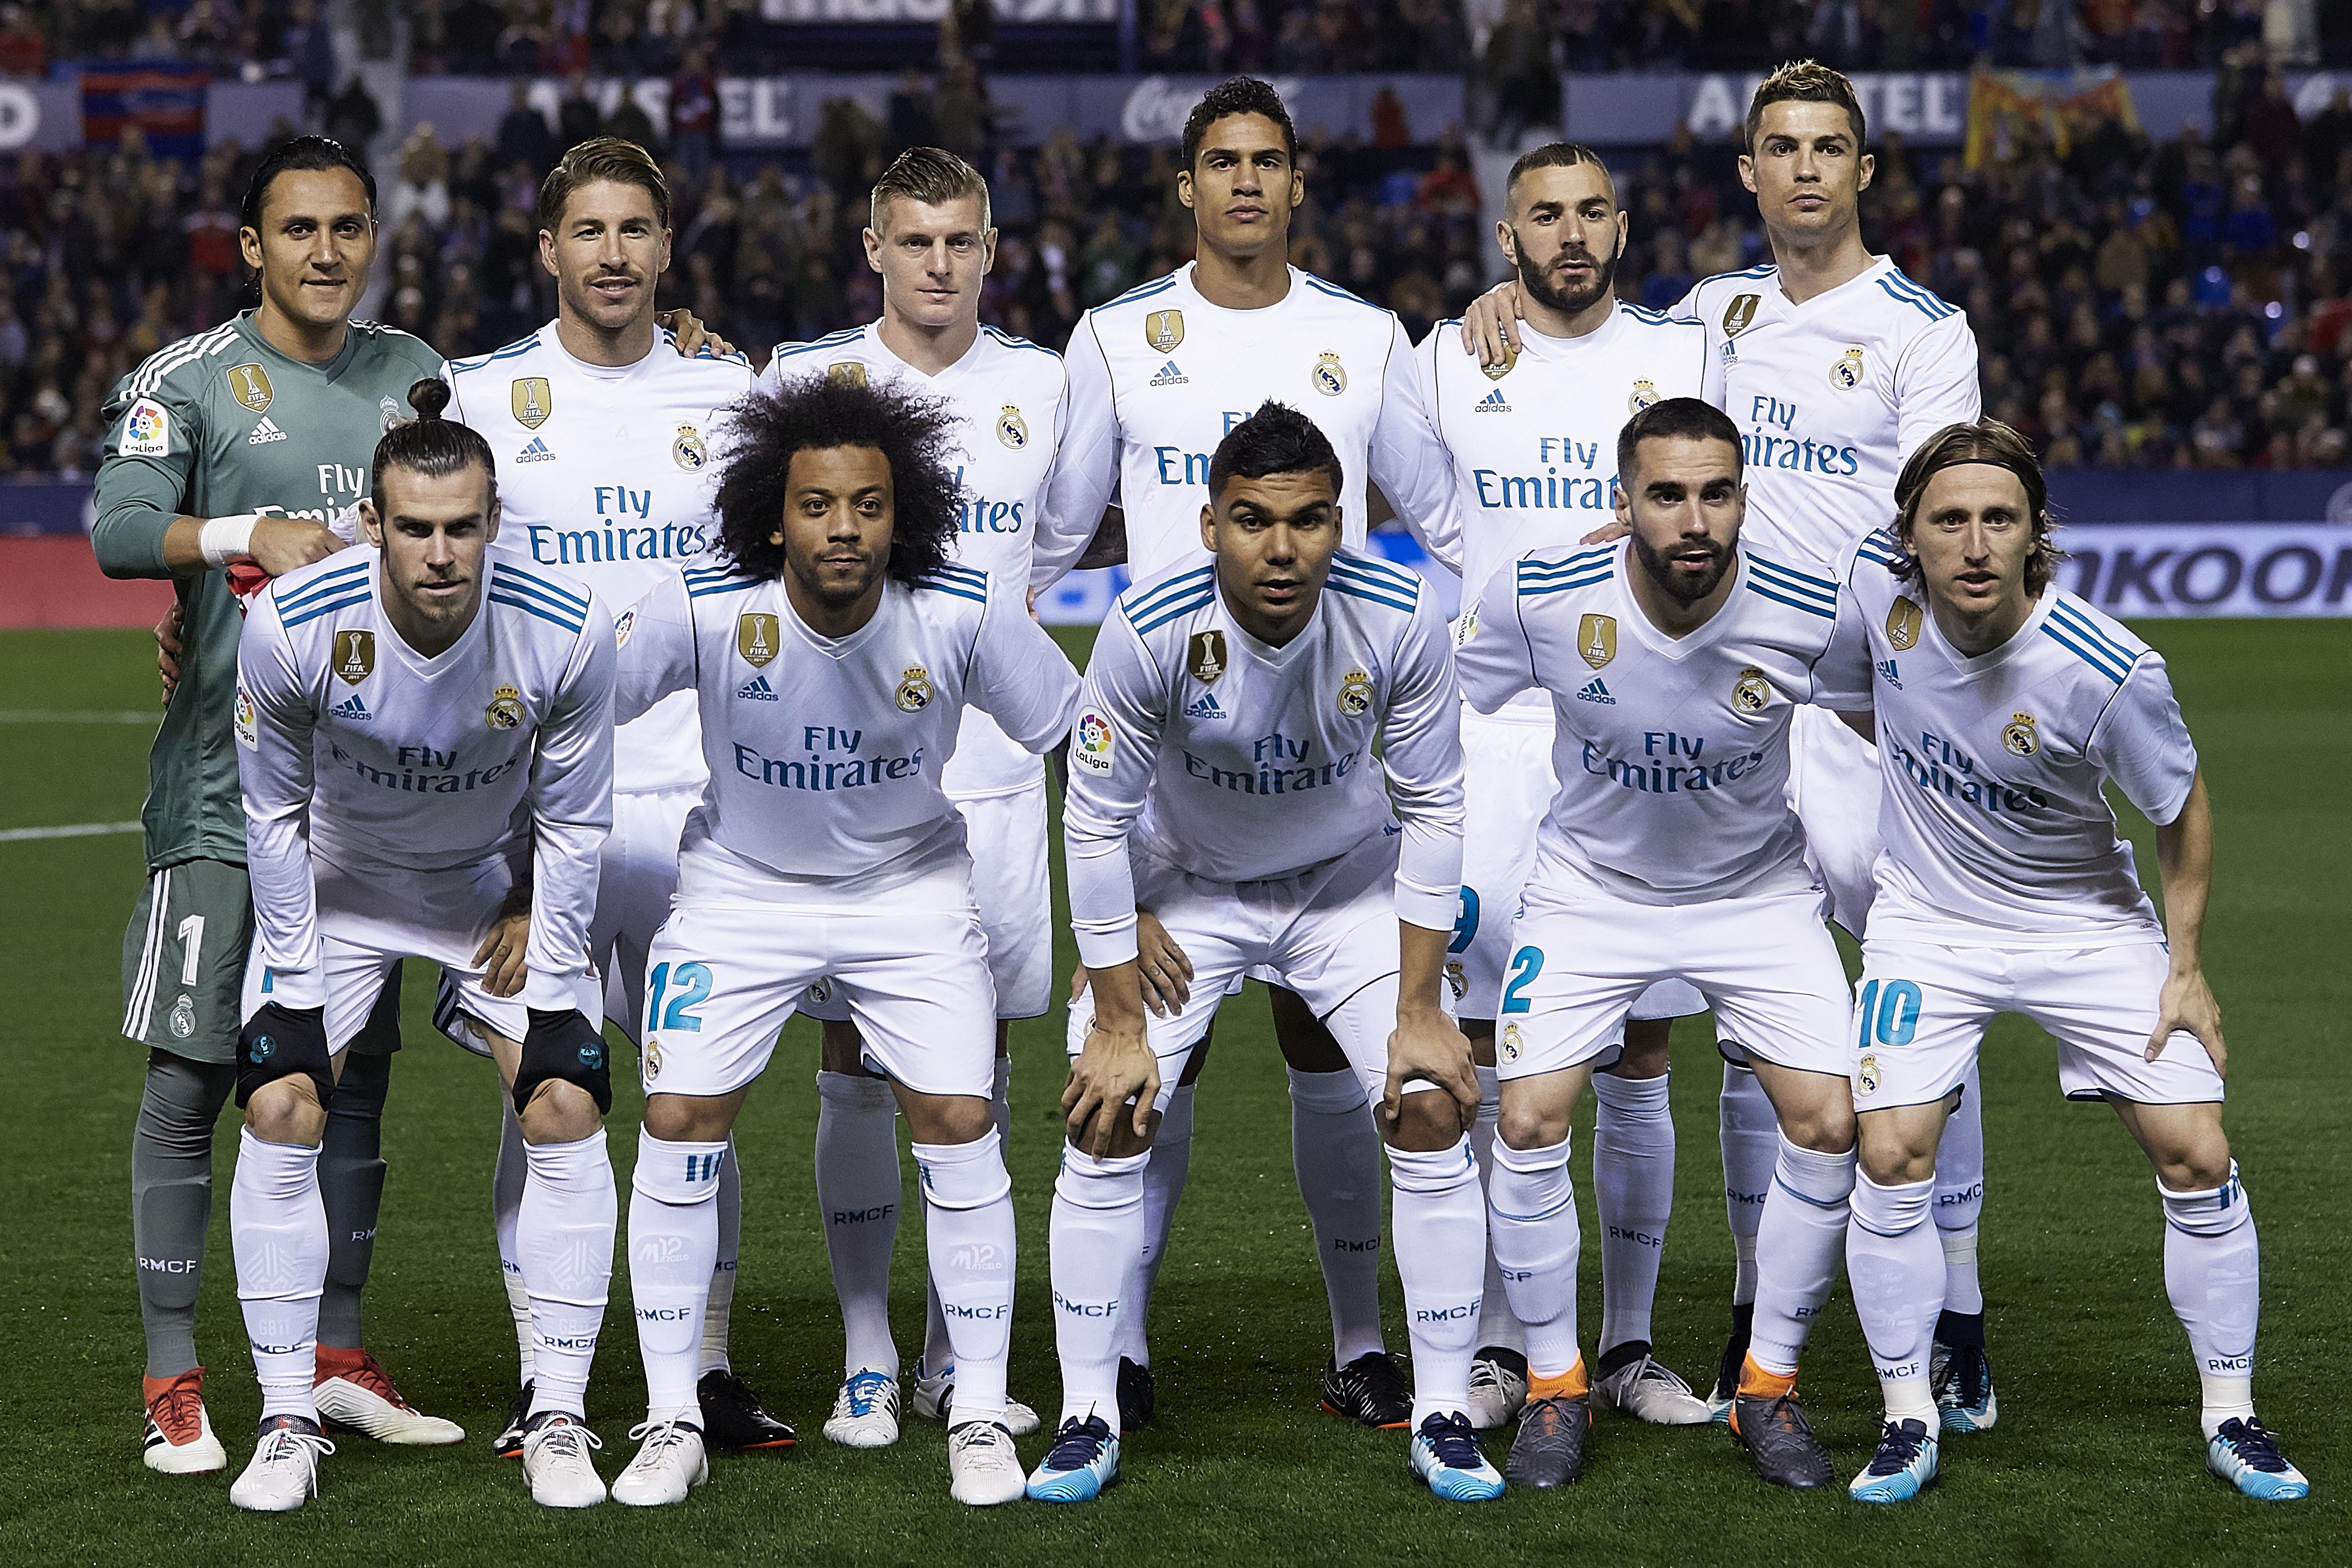 Levante v Real Madrid - La Liga